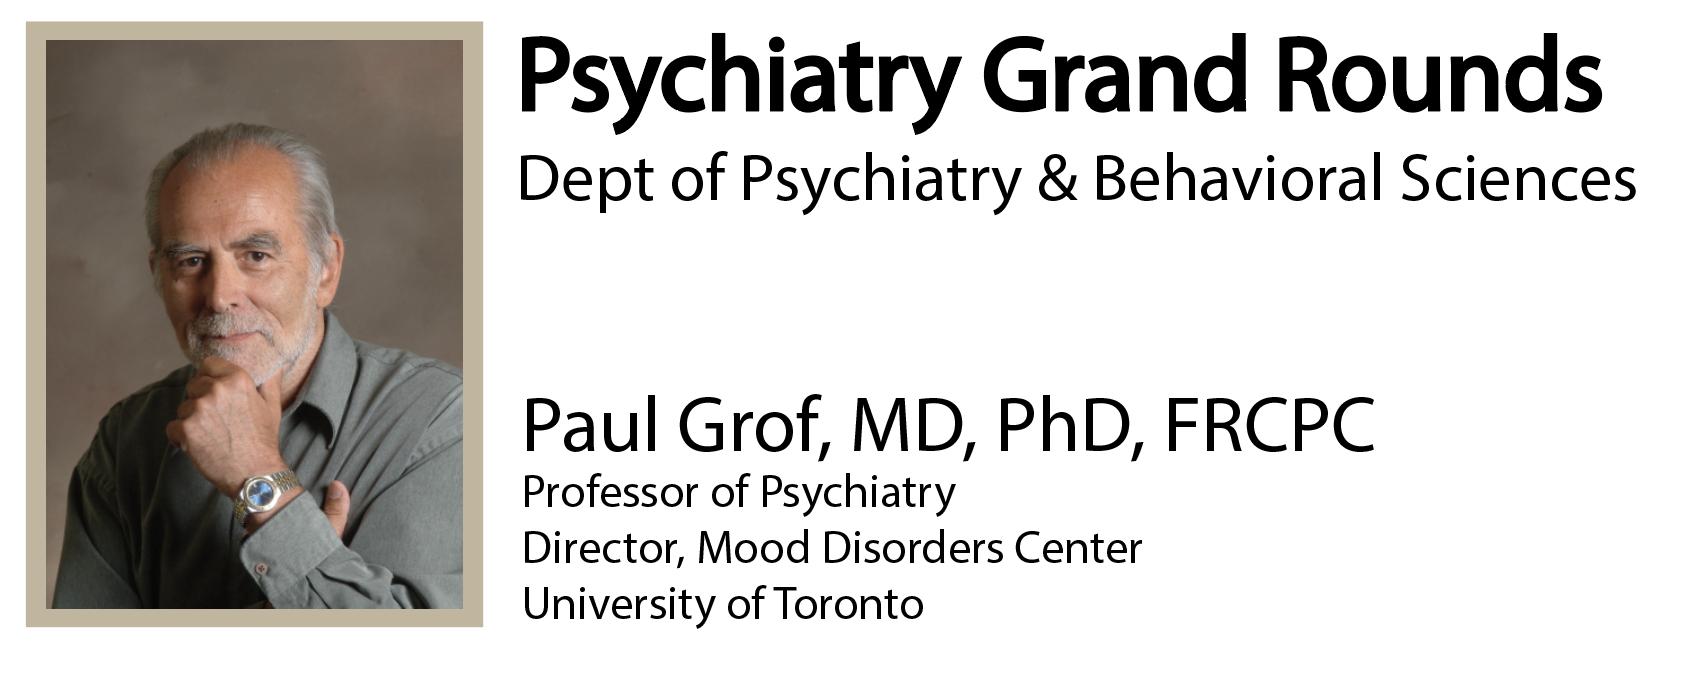 Paul Grof, MD, PhD